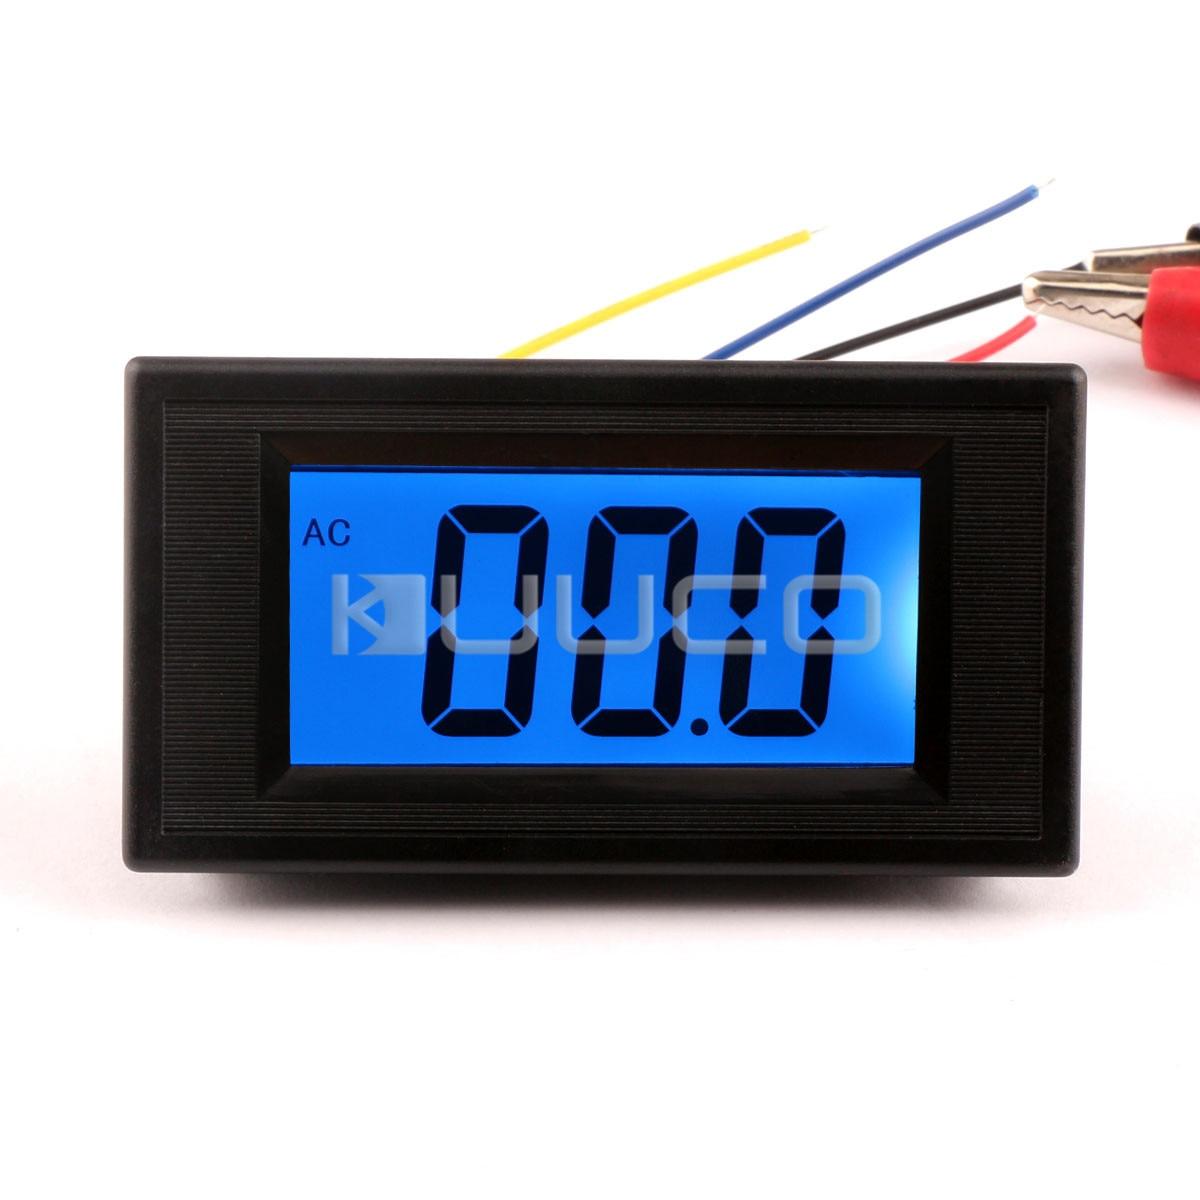 Ac Amp Meter Gauge Ampere 0 200ua Blue Lcd Display Ammeter Selector Switch Connection To Current Transformers And Digital Dc 8v 12v Tester